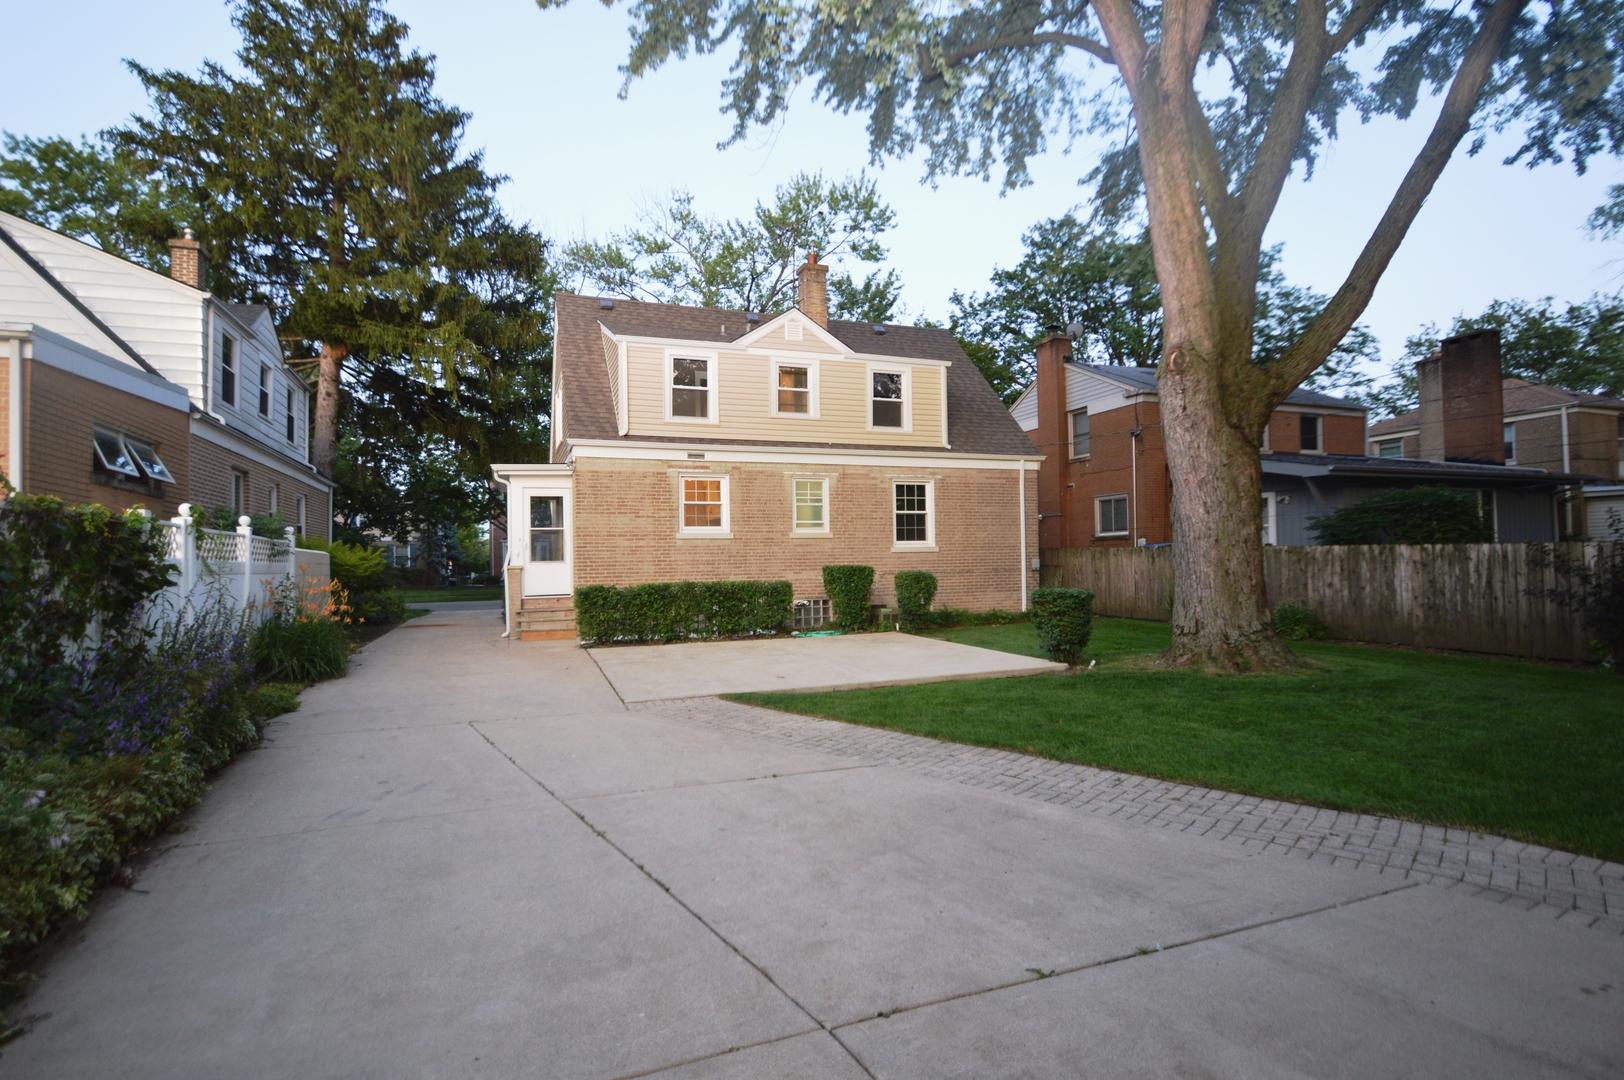 1906 PORTSMOUTH, Westchester, Illinois, 60154